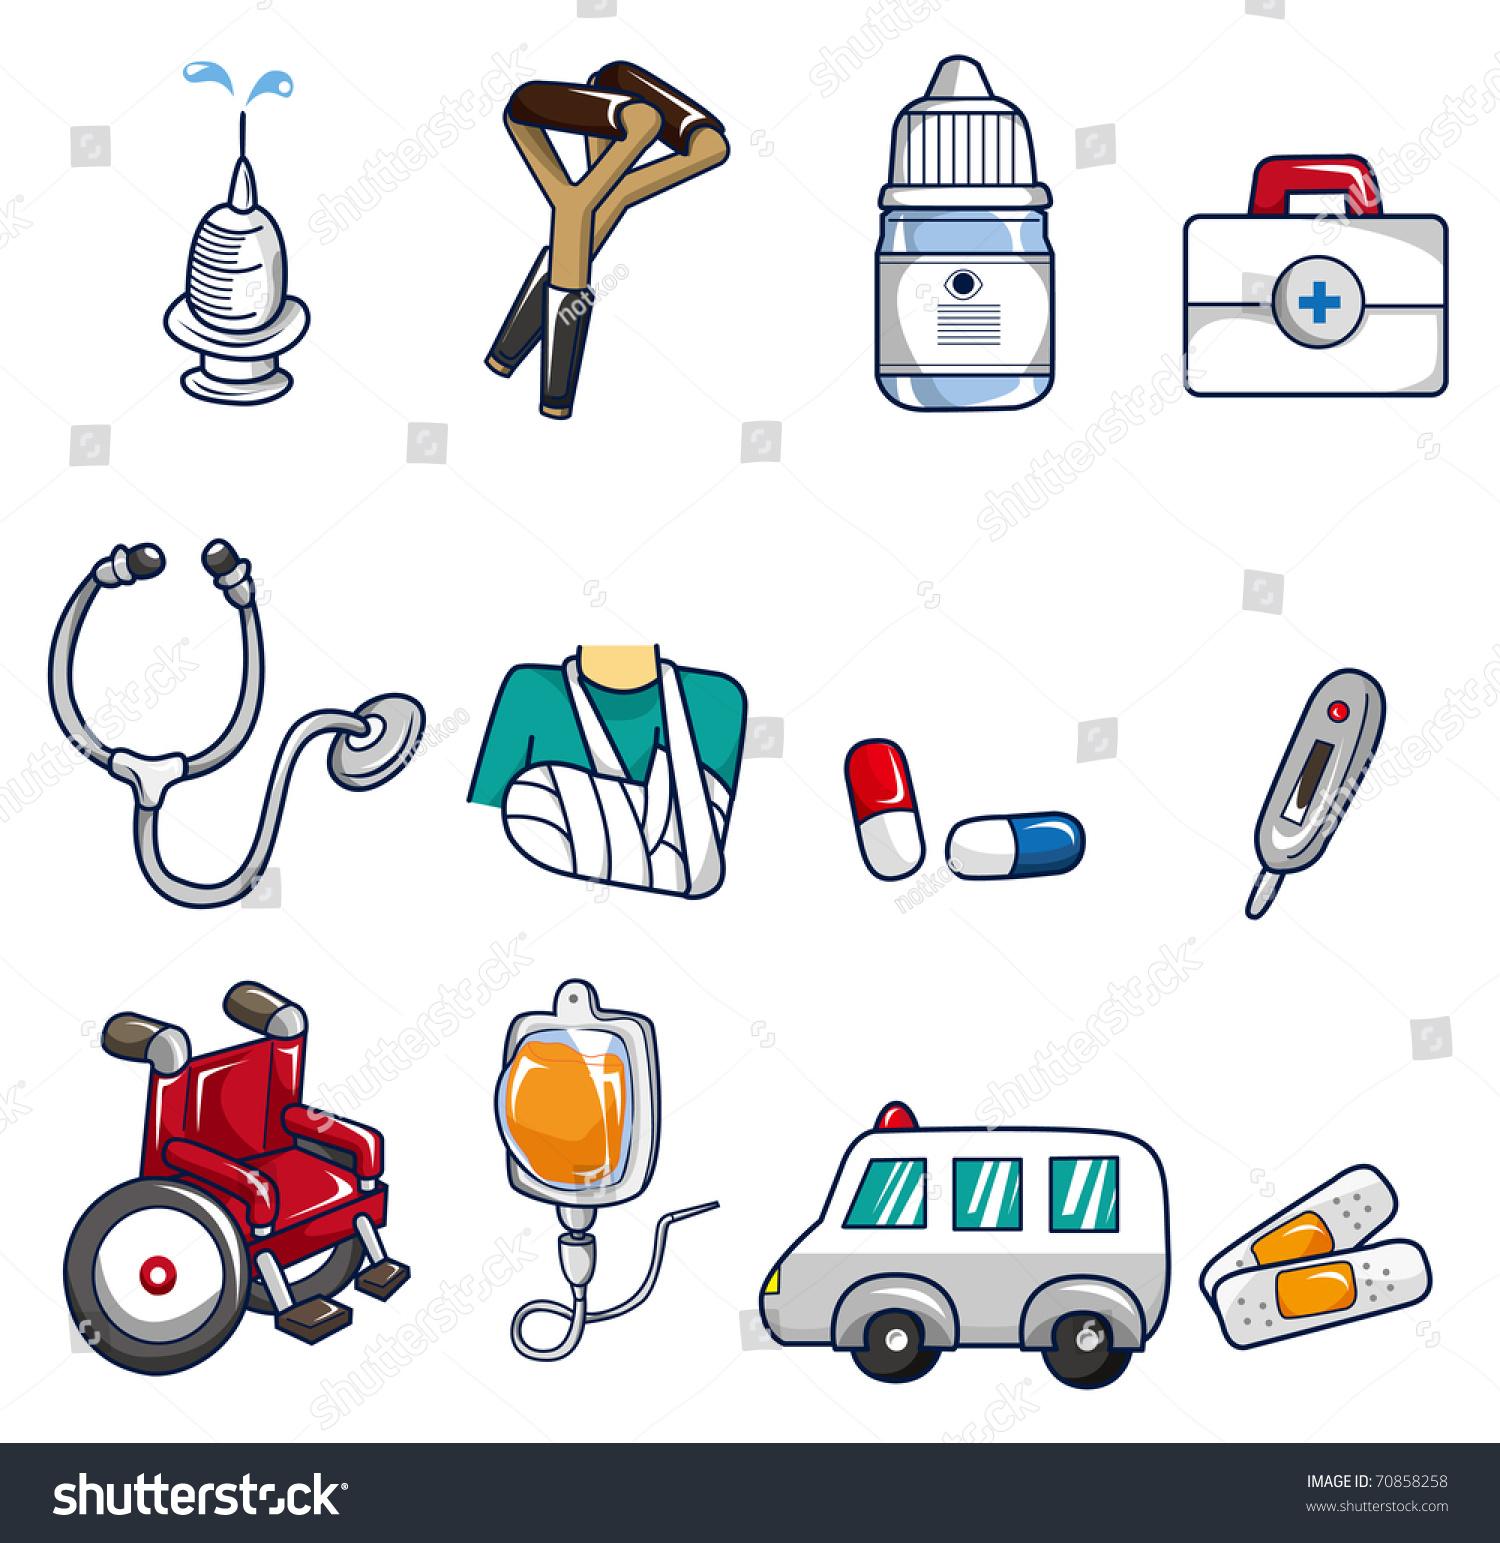 Cartoon Doctor Icon Stock Vector 70858258 : Shutterstock